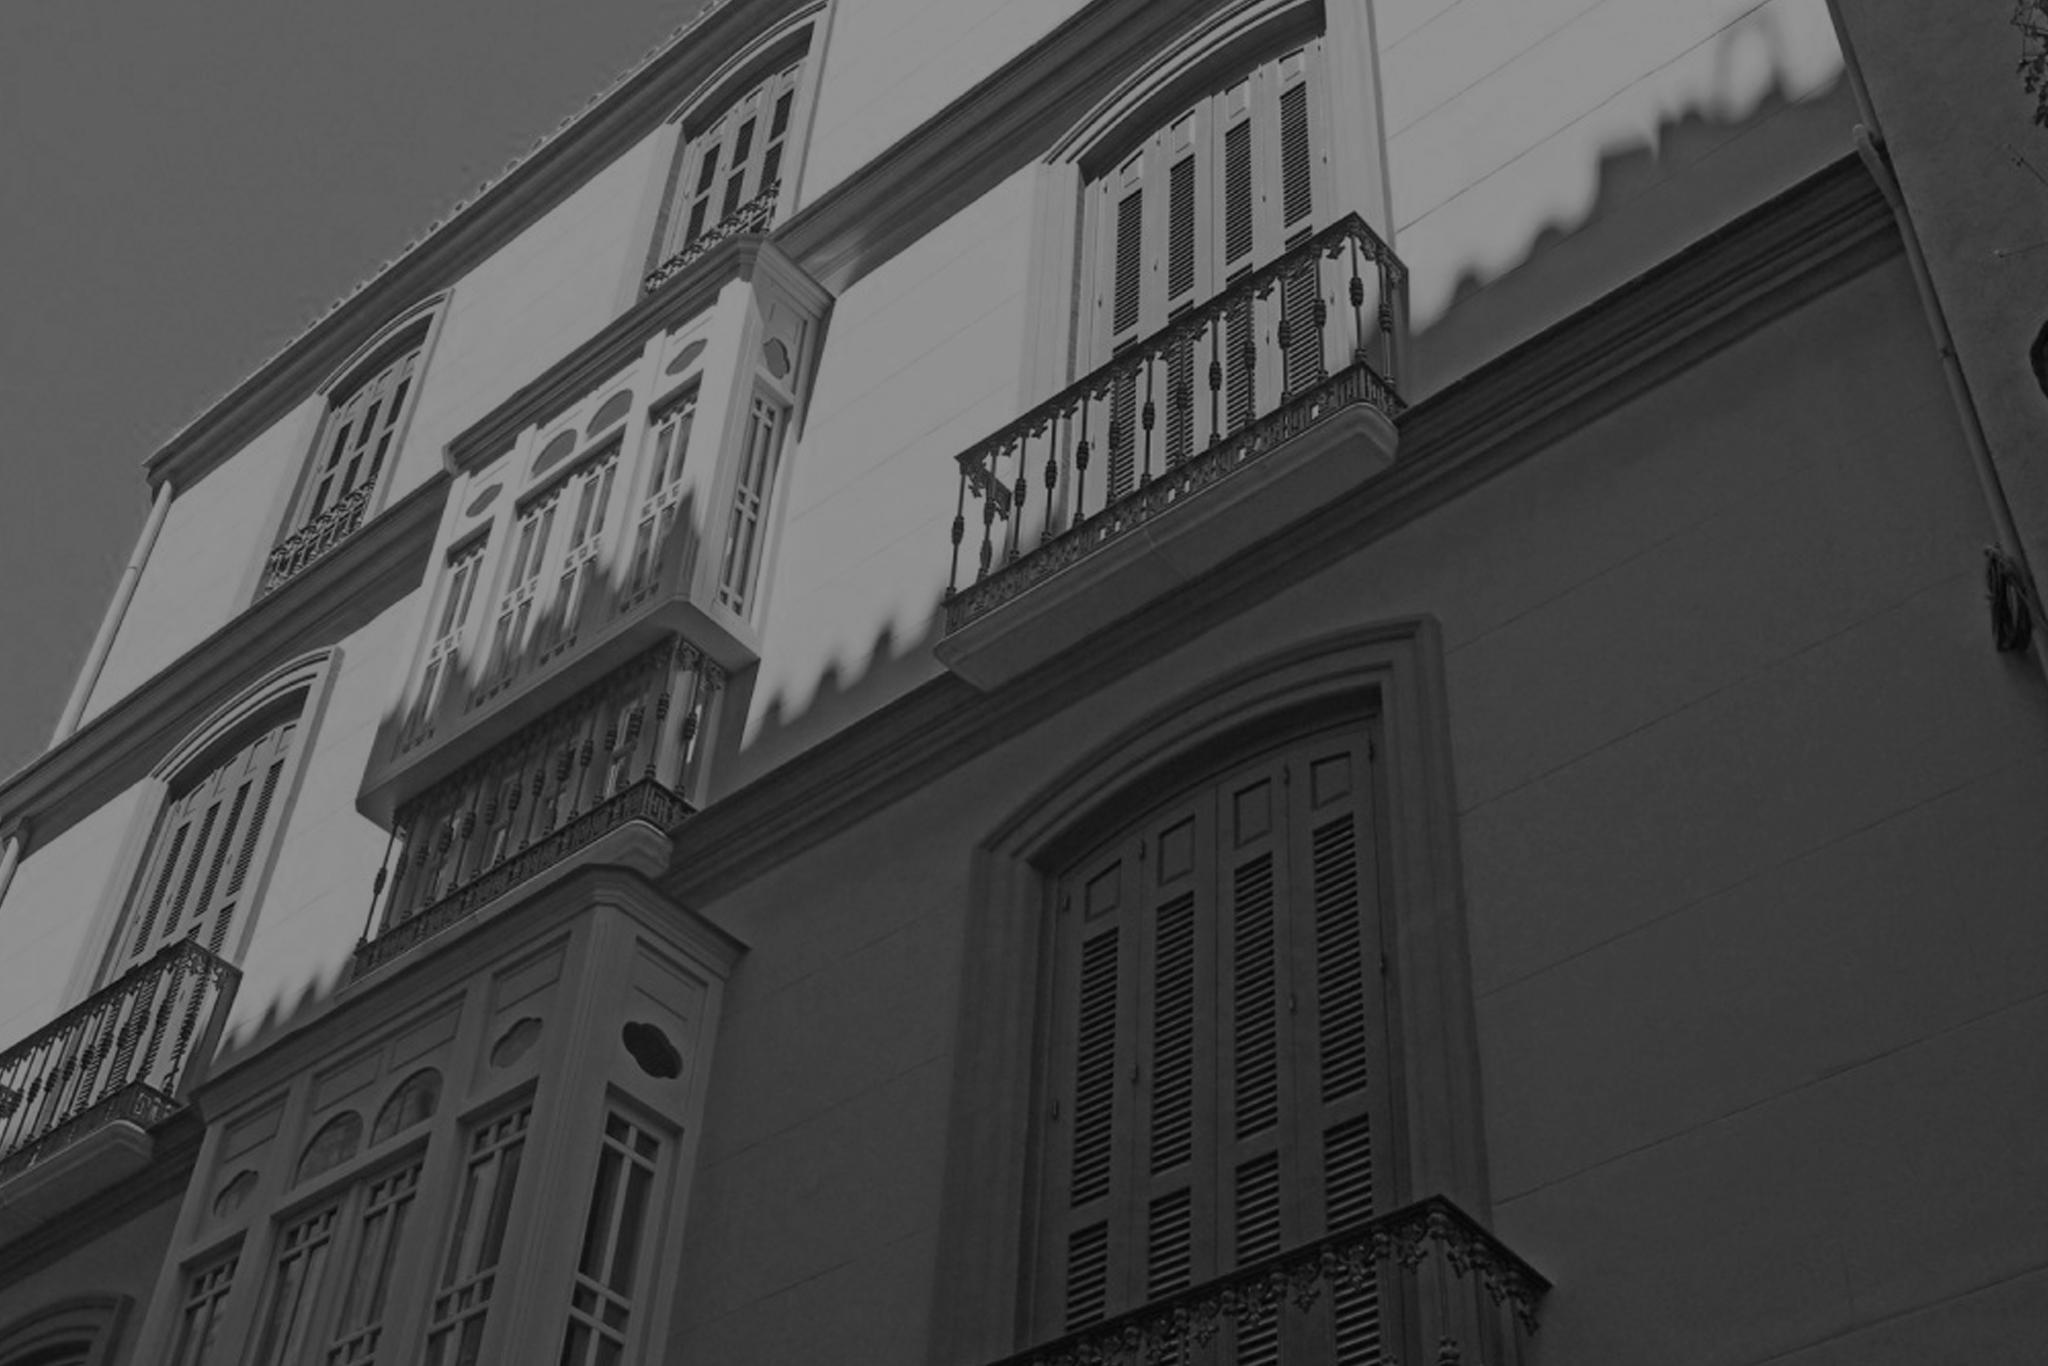 http://syga.es/wp-content/uploads/guevara_gris.jpg